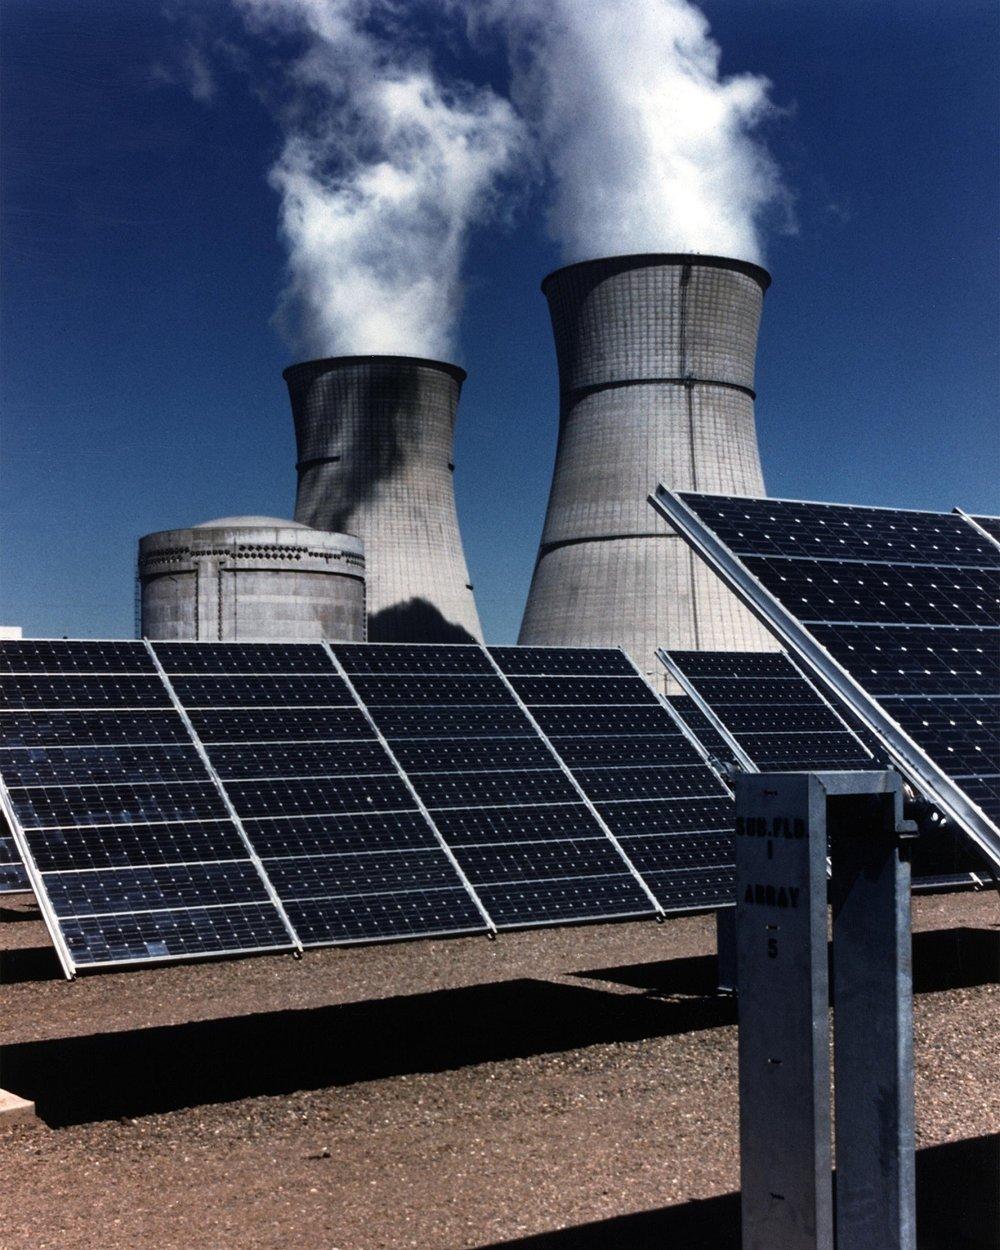 electricity-energy-industry-236060.jpg